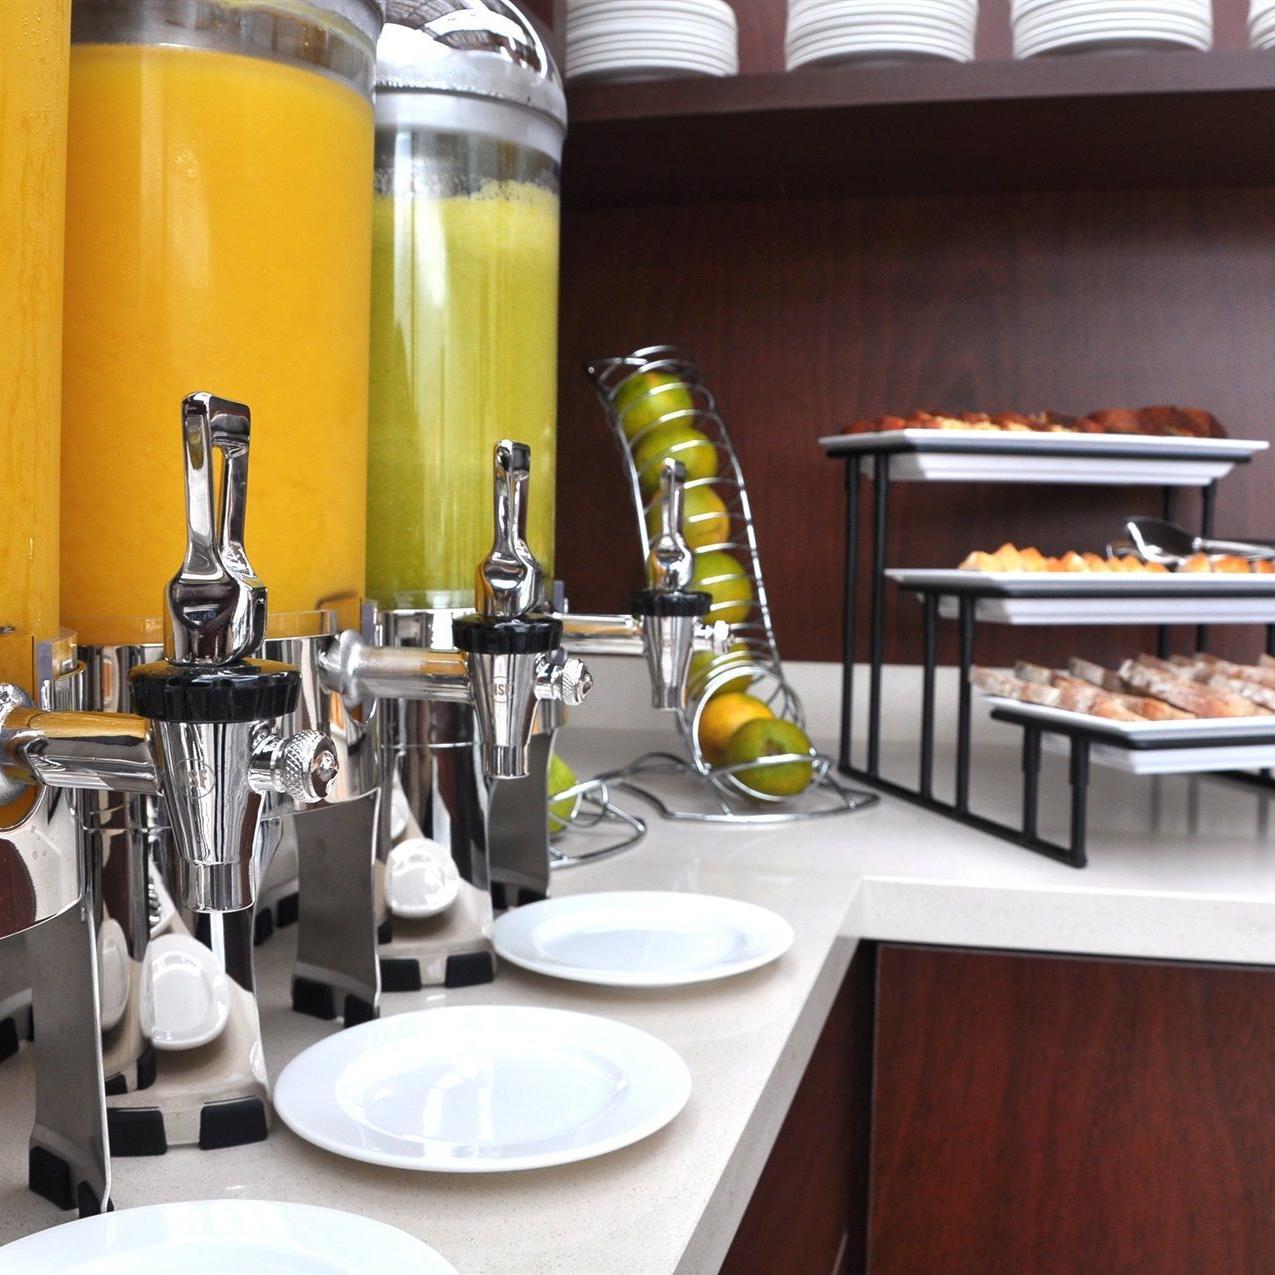 Bufett desayuno restaurante